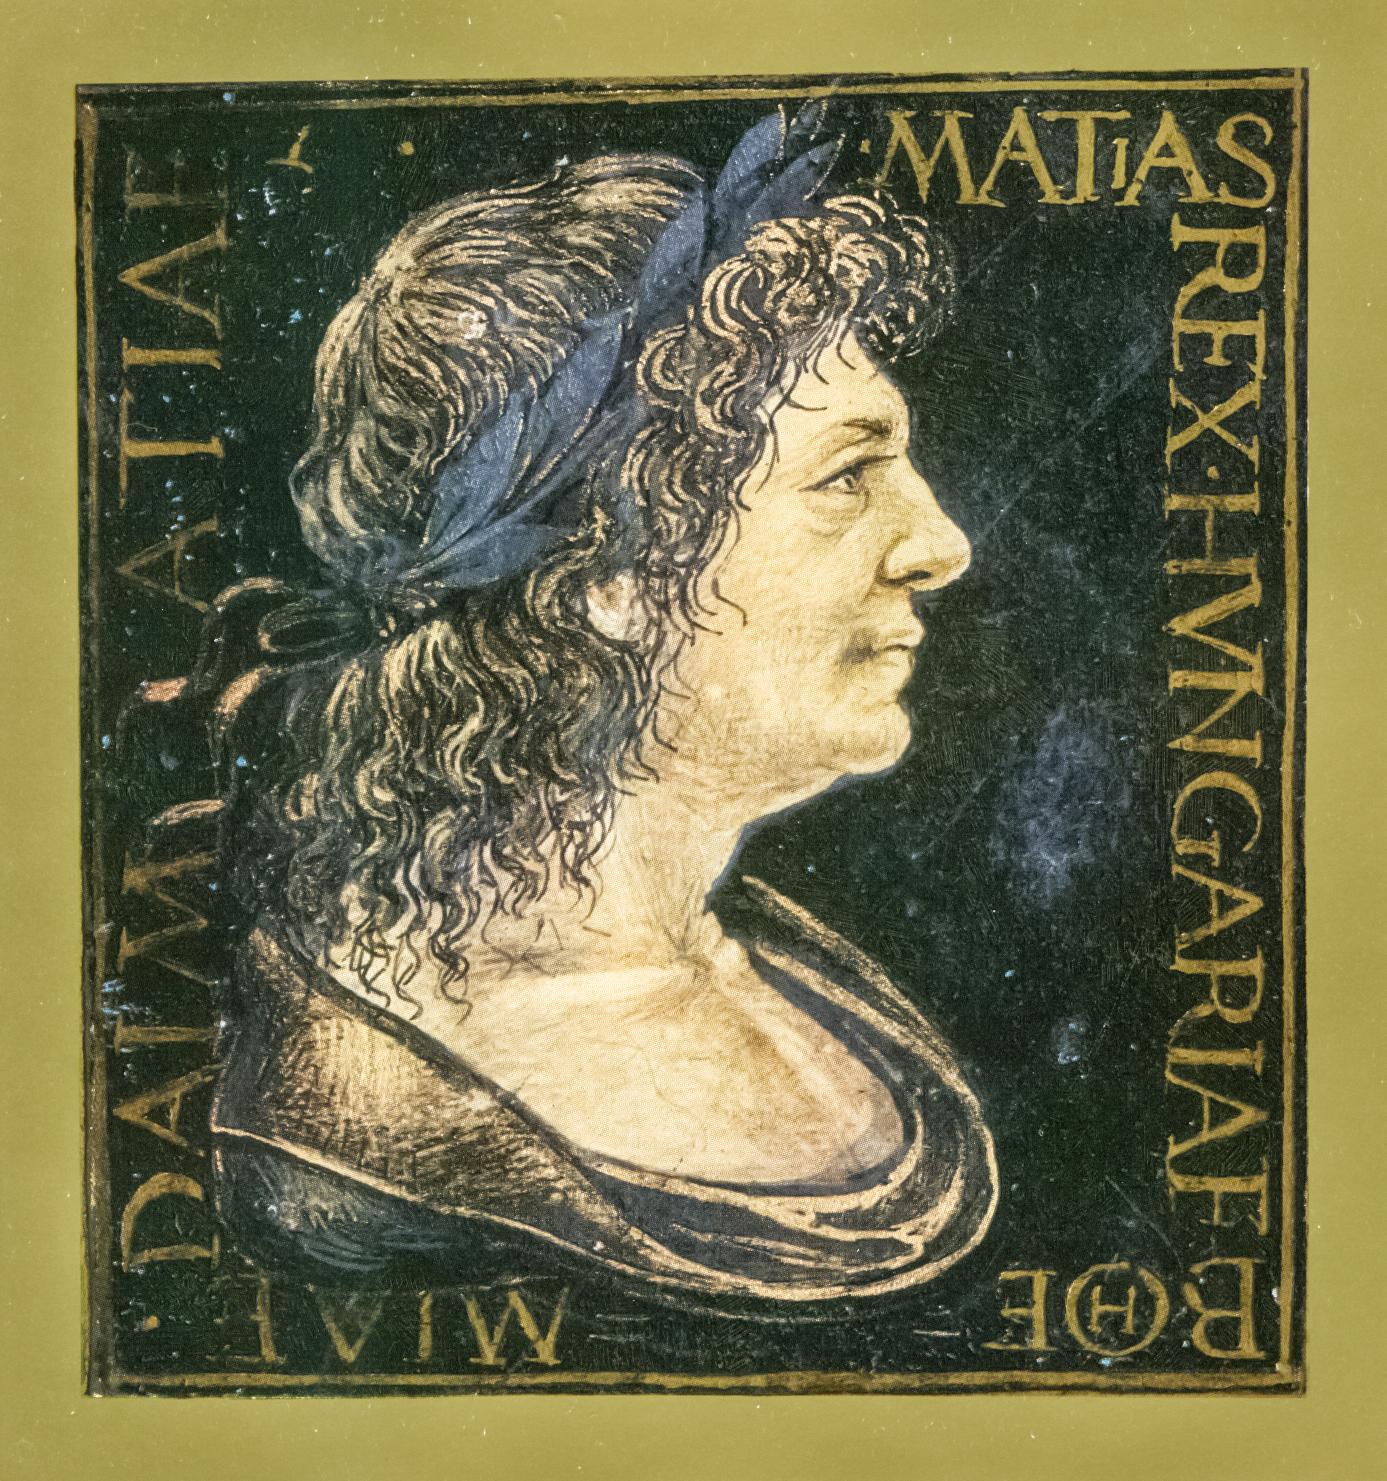 matthias_corvinus_from_a_corvina_codex_1.jpg